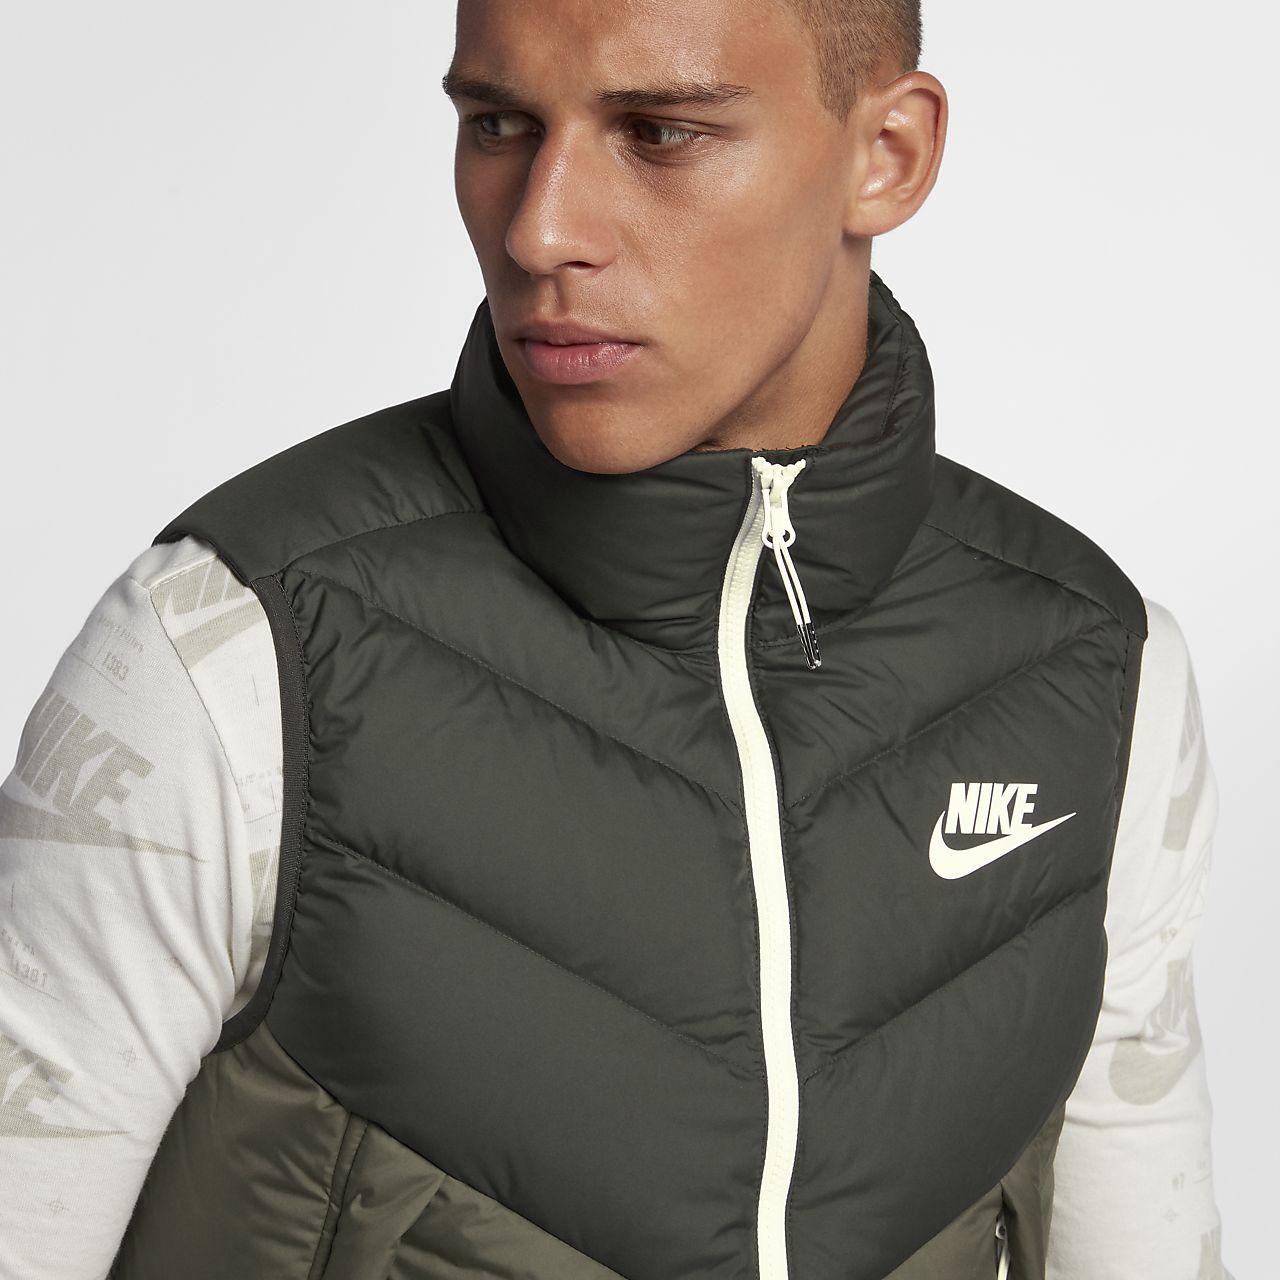 377a35afe61c Nike Sportswear Windrunner Down Fill Men s Gilet. Nike.com AU